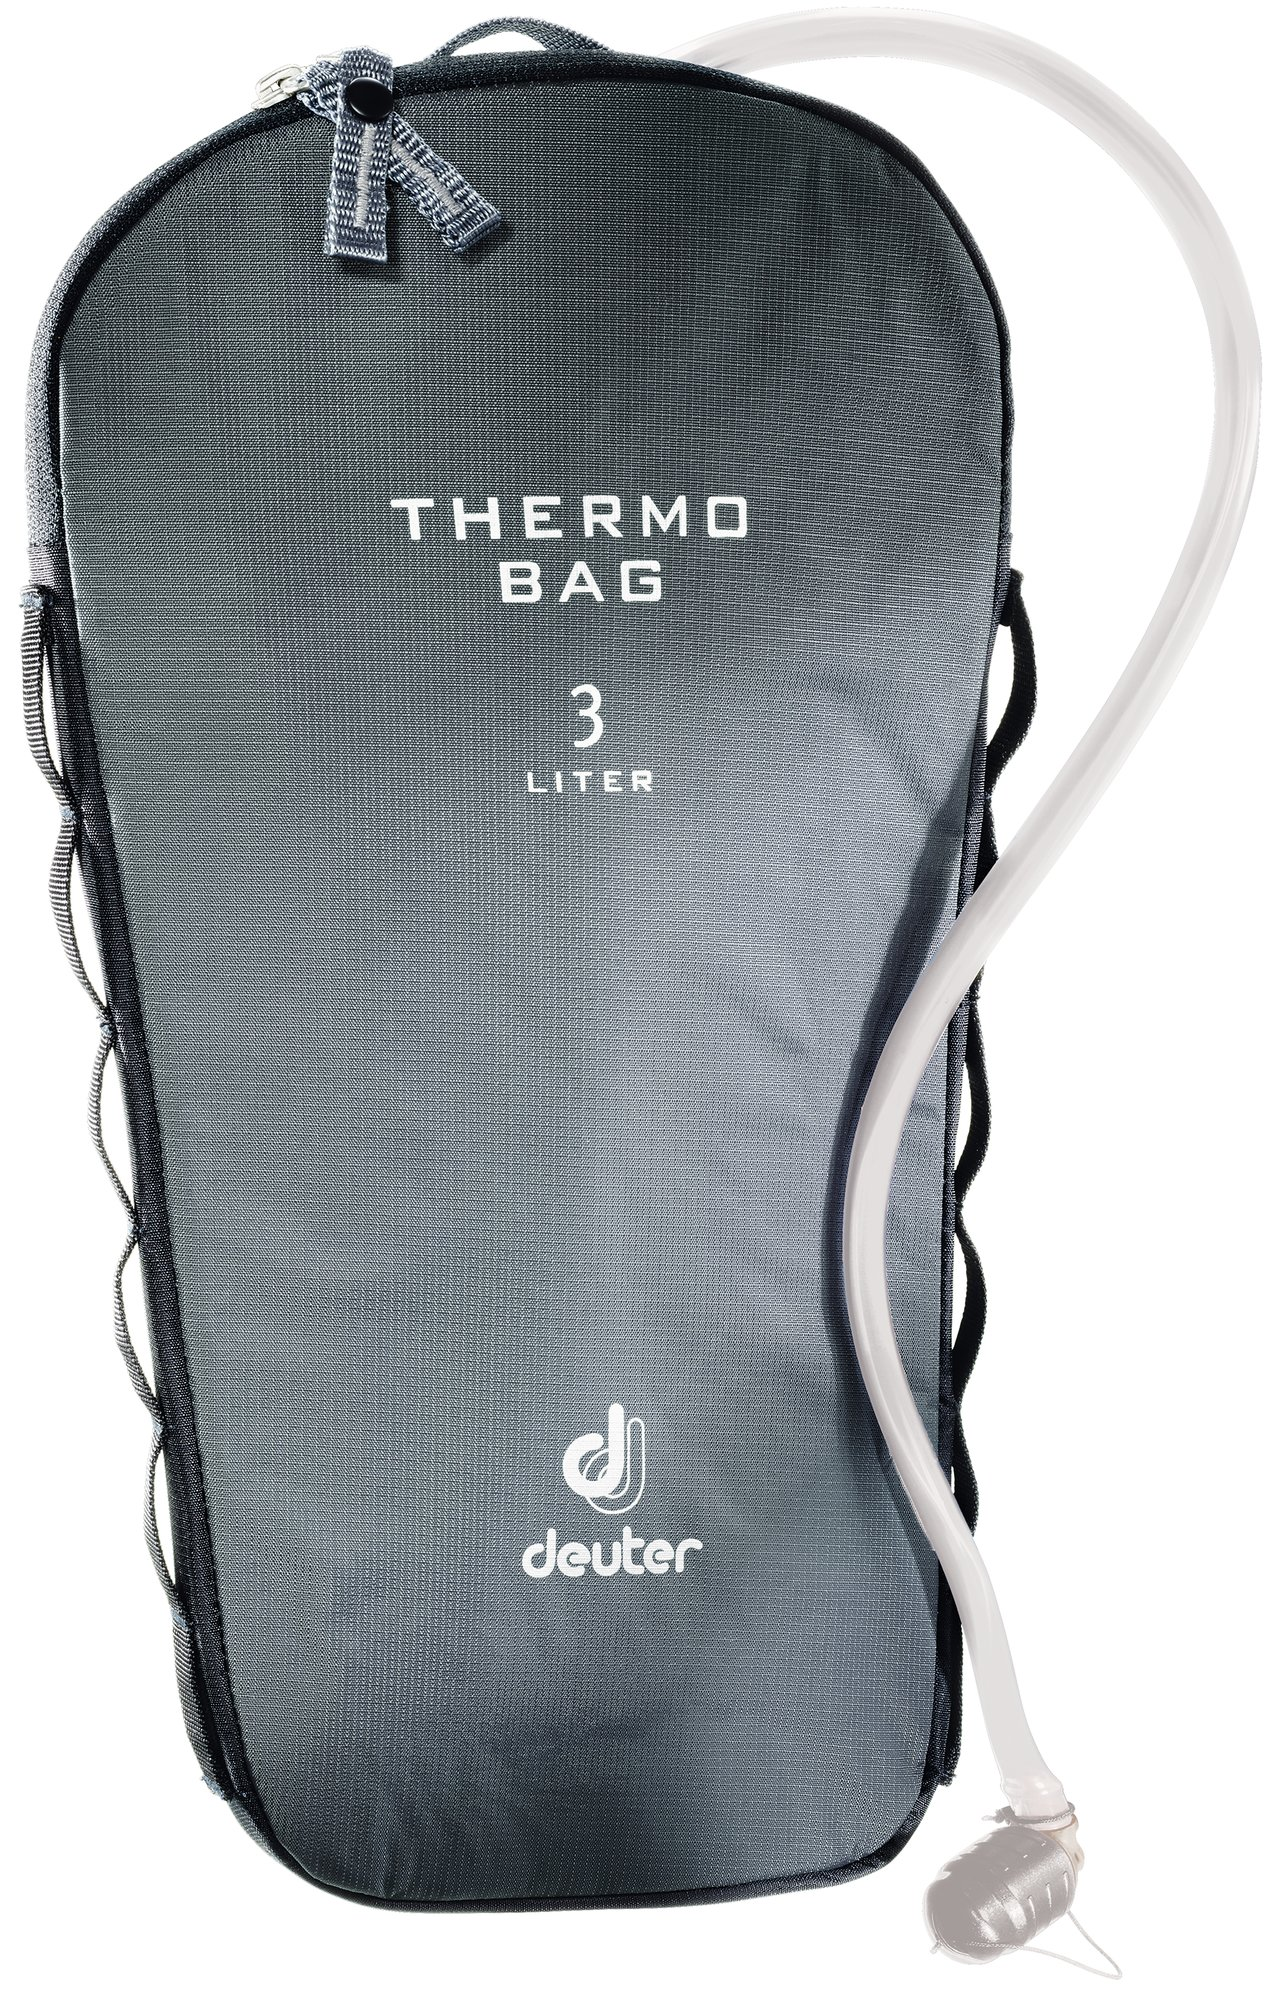 Deuter - Streamer Thermo Bag 3.0 L, Trinksystem